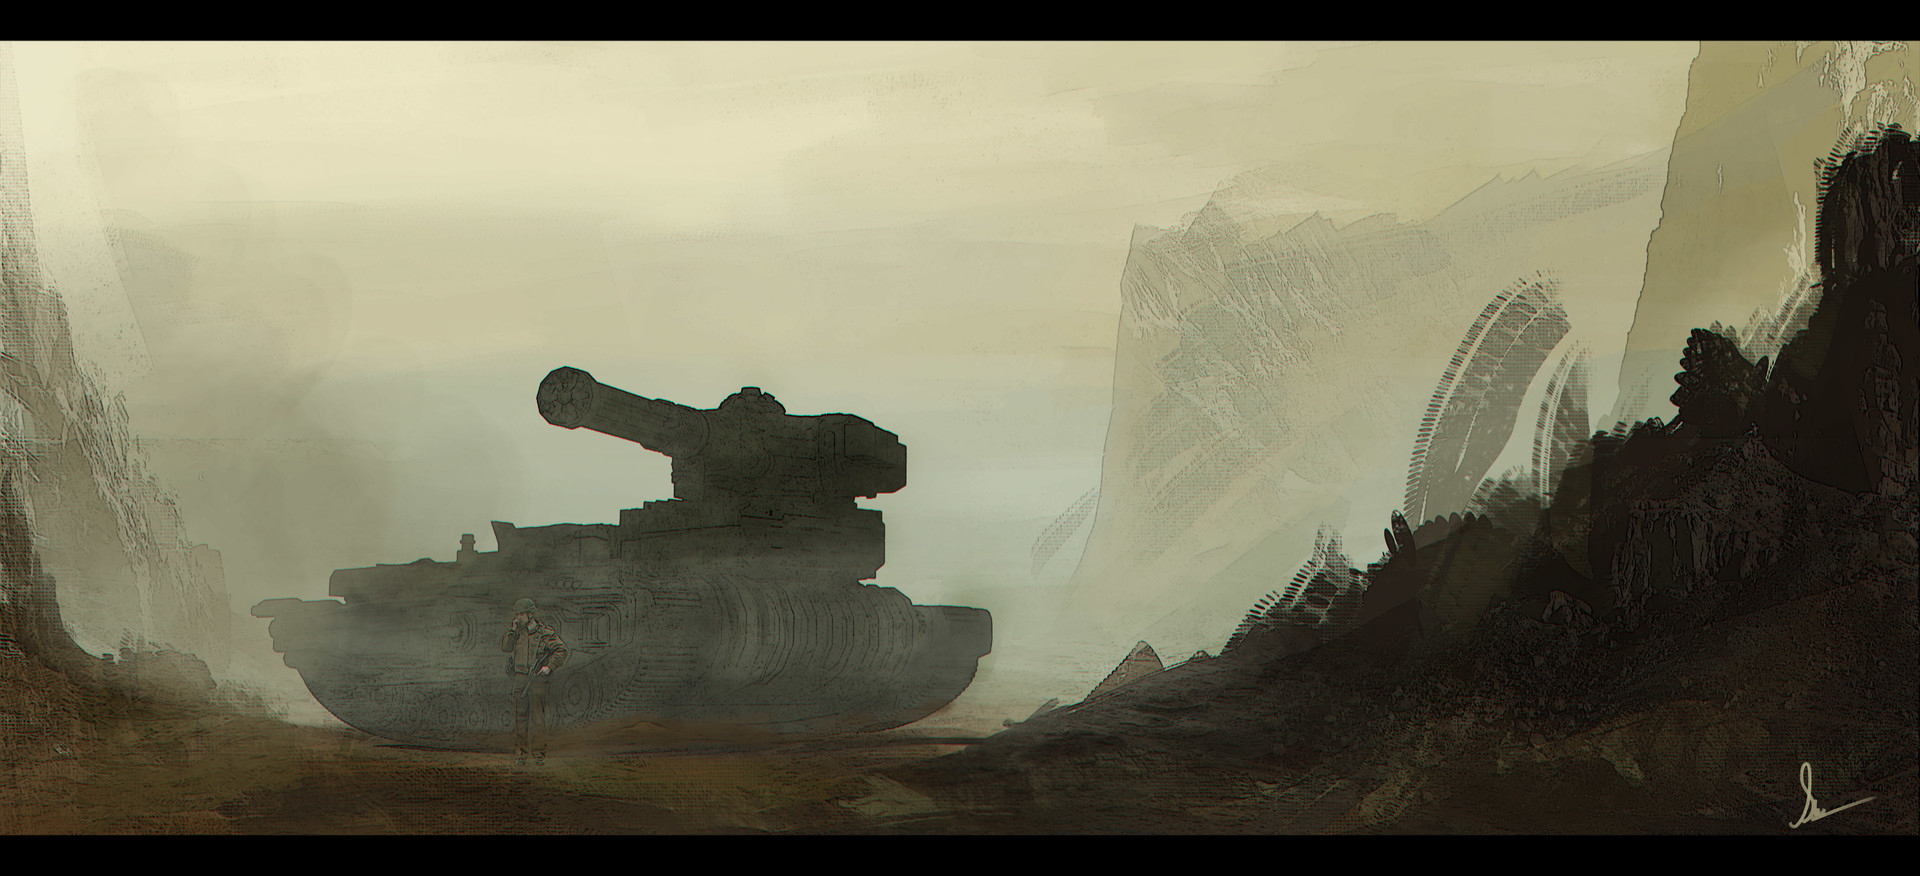 Shwetank shukla tank